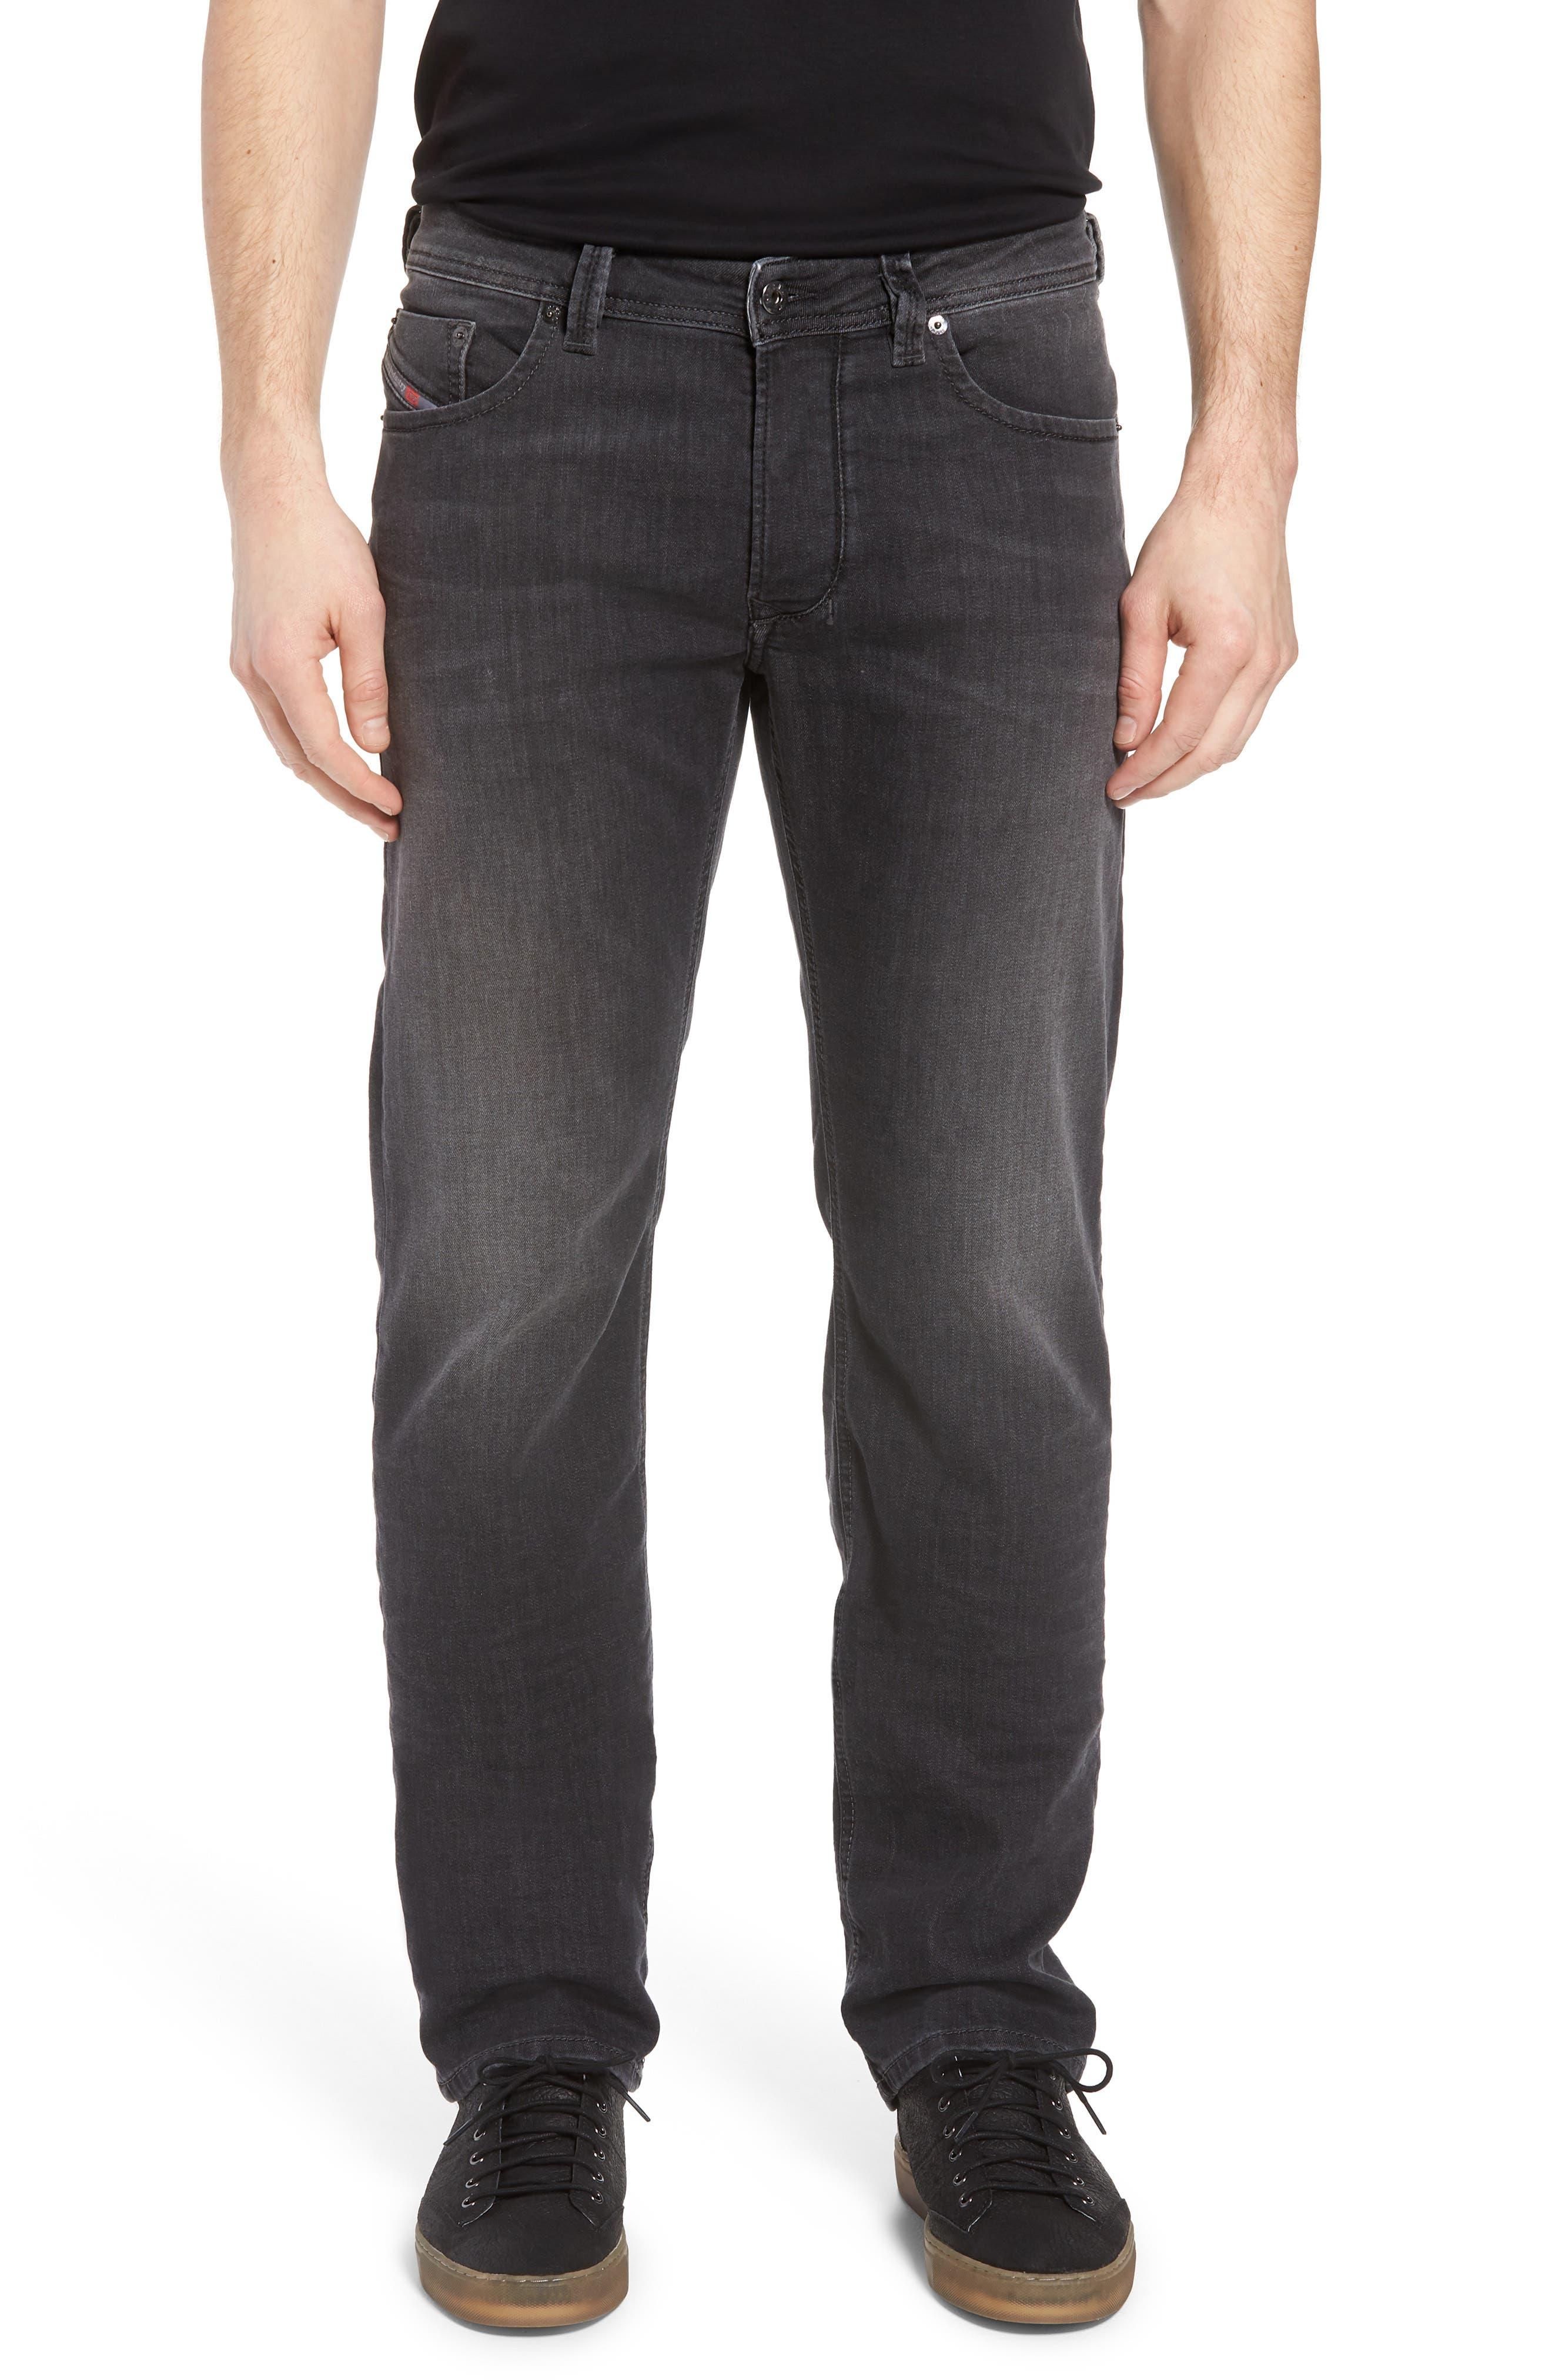 Larkee Relaxed Fit Jeans,                             Main thumbnail 1, color,                             Black/Denim